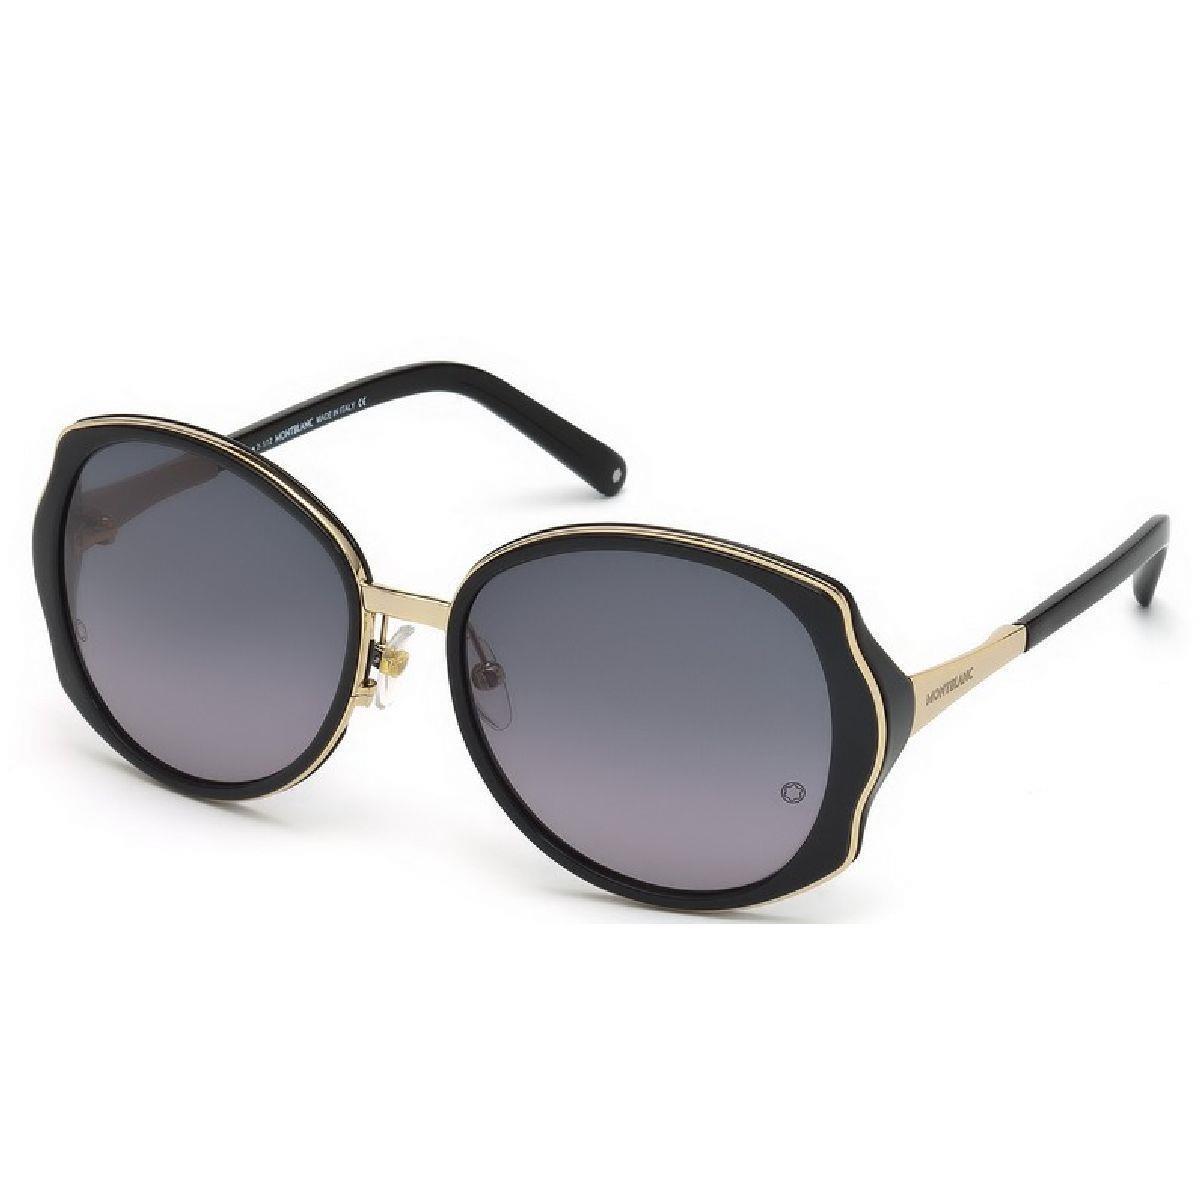 Óculos de Sol Feminino Mont blanc - MB416S.01B 58 - MB416S.01B 58 - MONT  BLANC b6110b94af